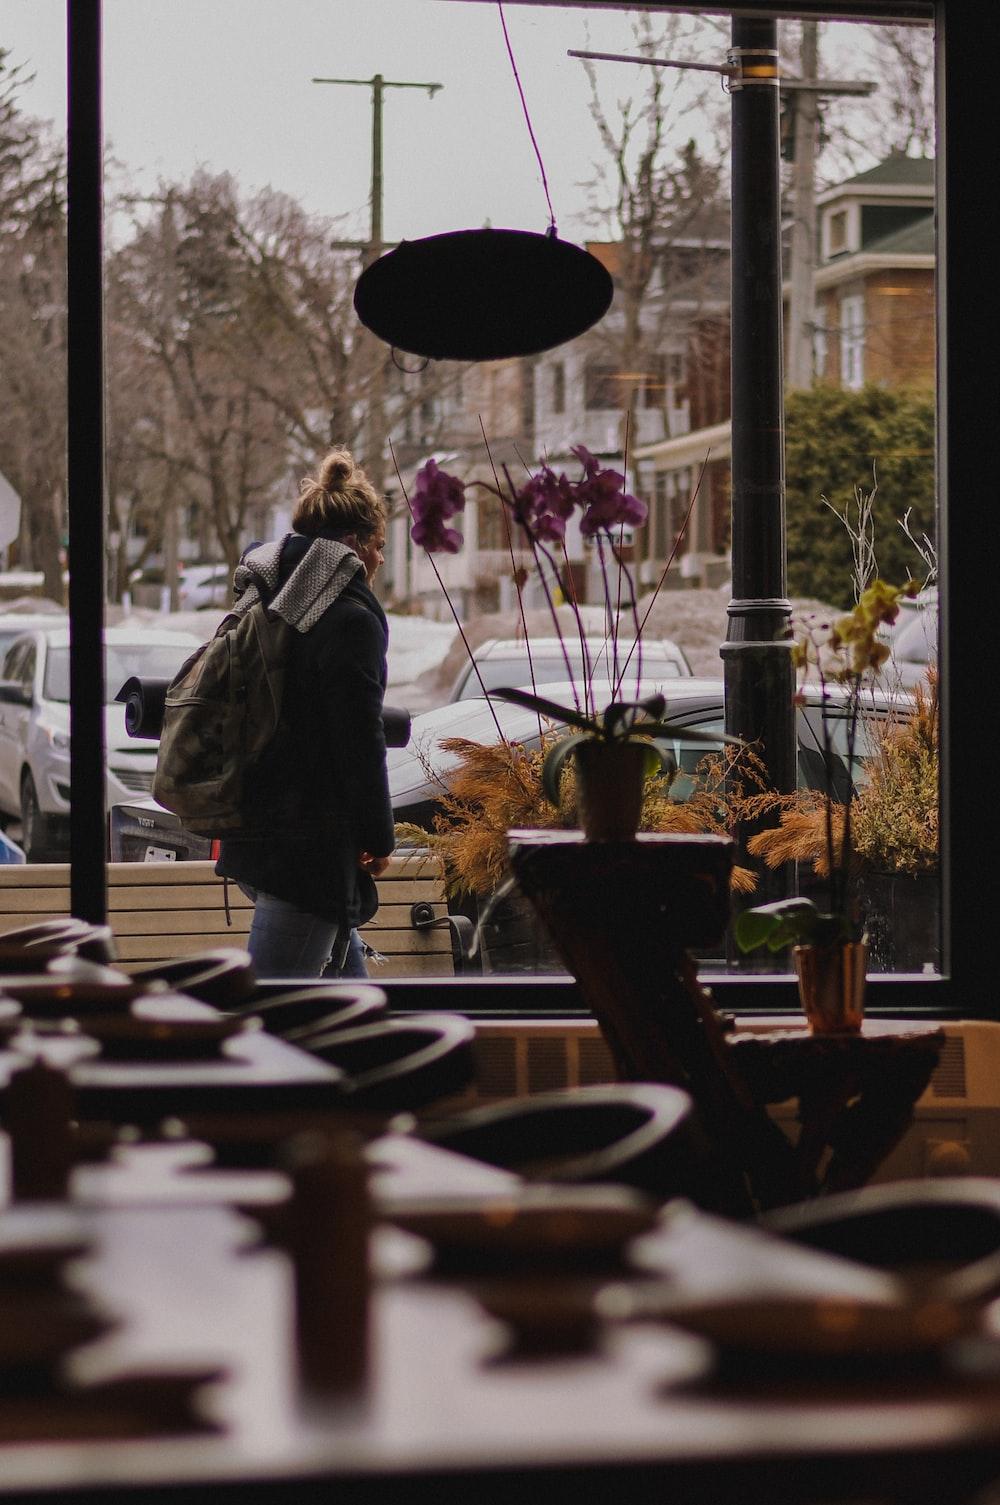 woman walks on sidewalk